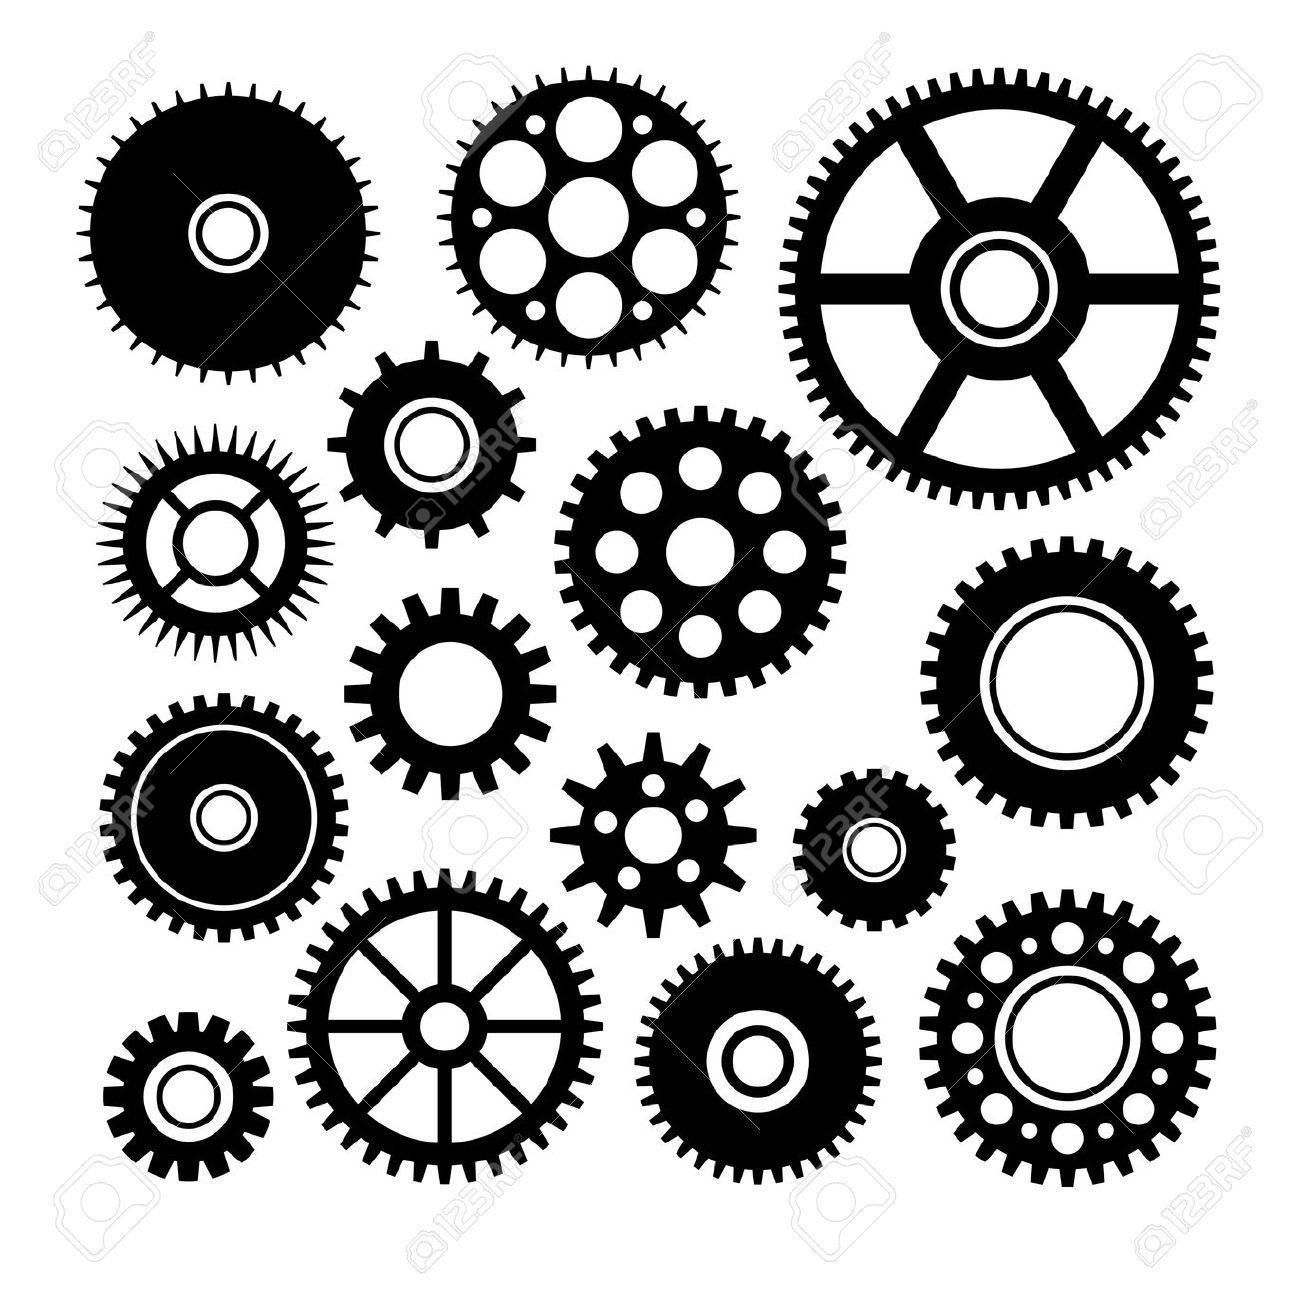 Clock Gear Vector At Getdrawings Com Free For Personal Use Clock